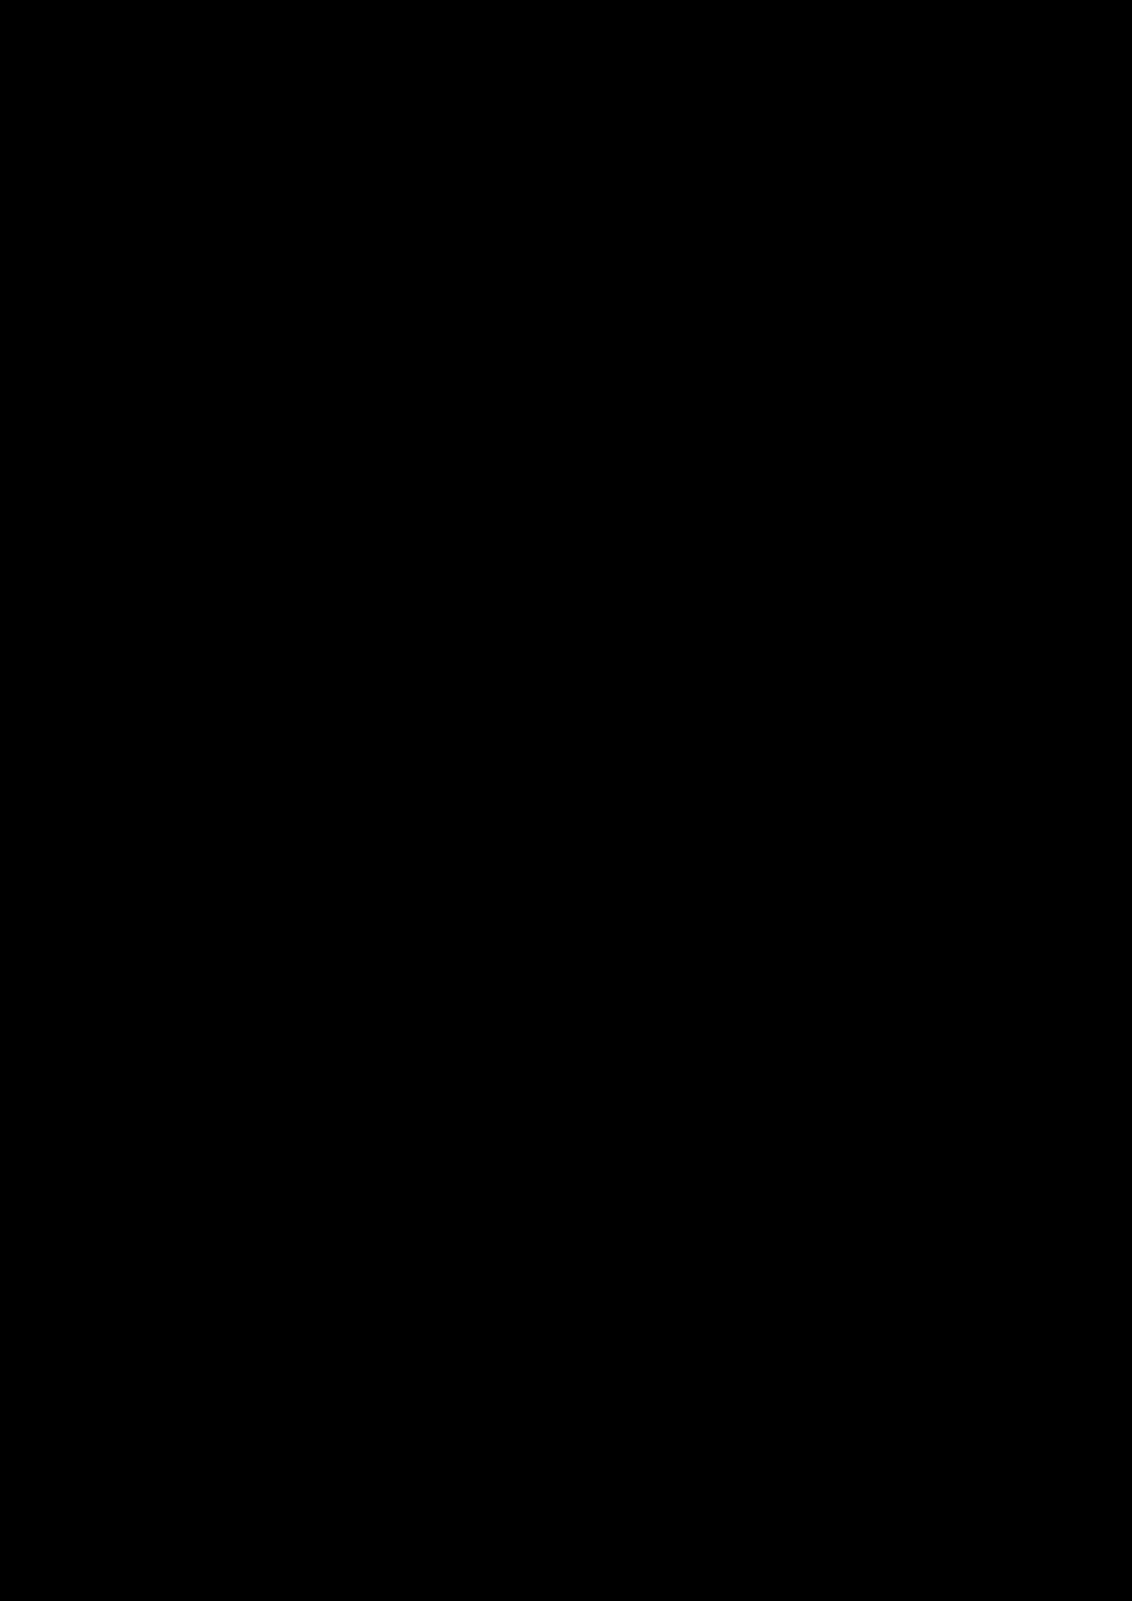 Prosti slide, Image 11